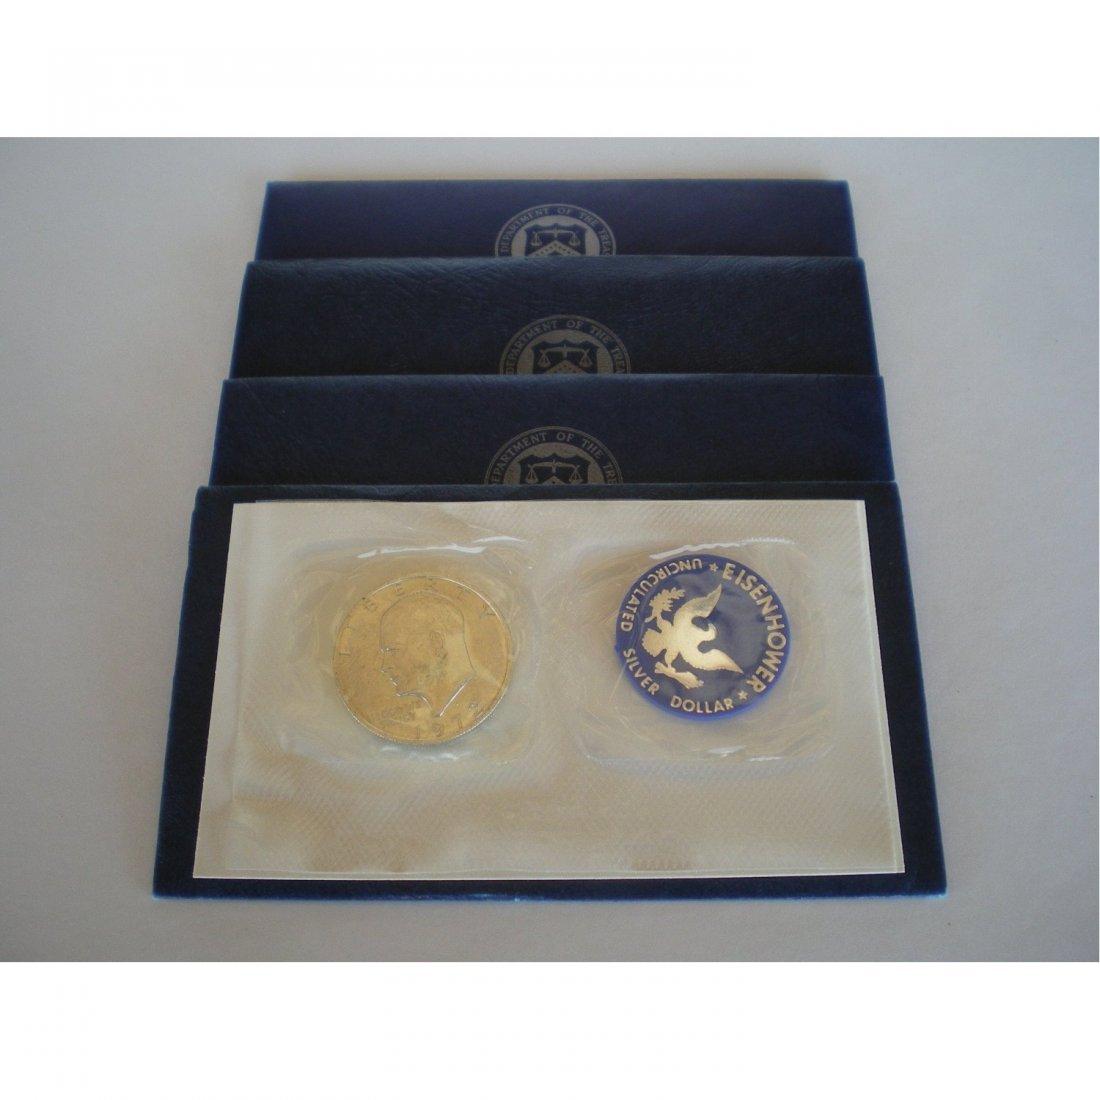 6A: Eisenhower Uncirculated Silver Dollar - Blue Pack